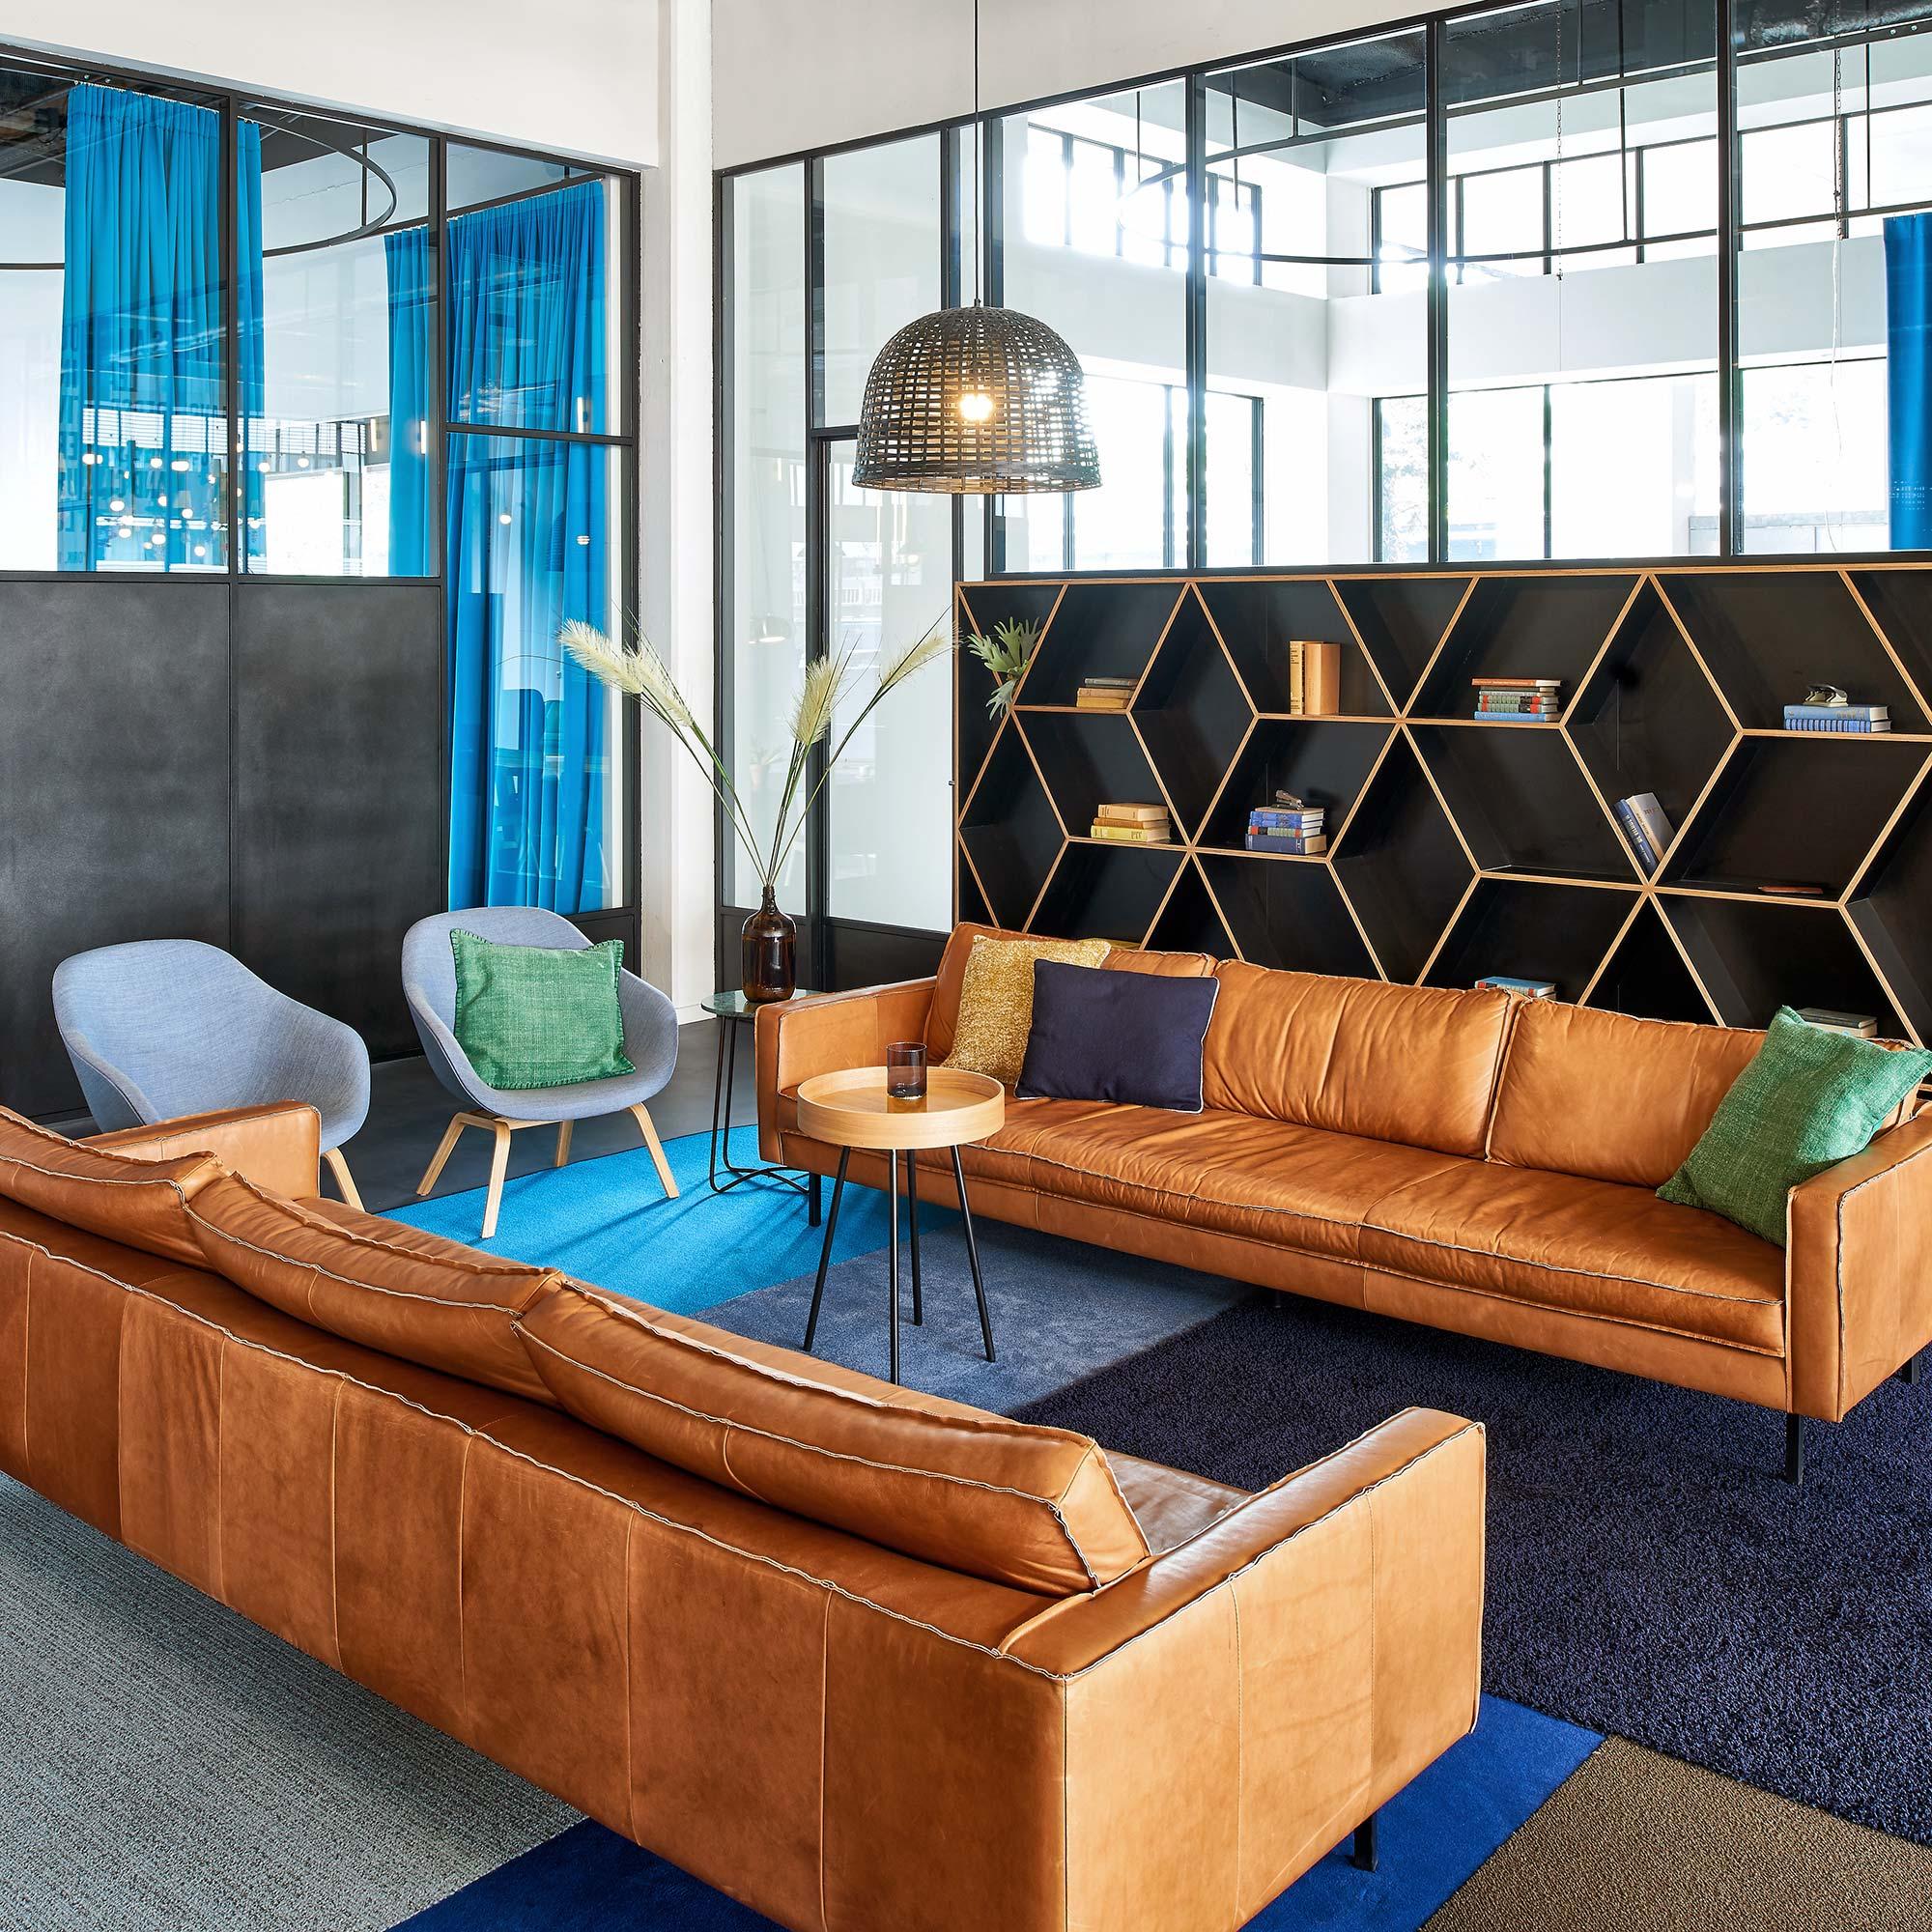 Johnny River, Amsterdam - Merin - Interieurfotograaf kantoorgebouw Chiel de Nooyer